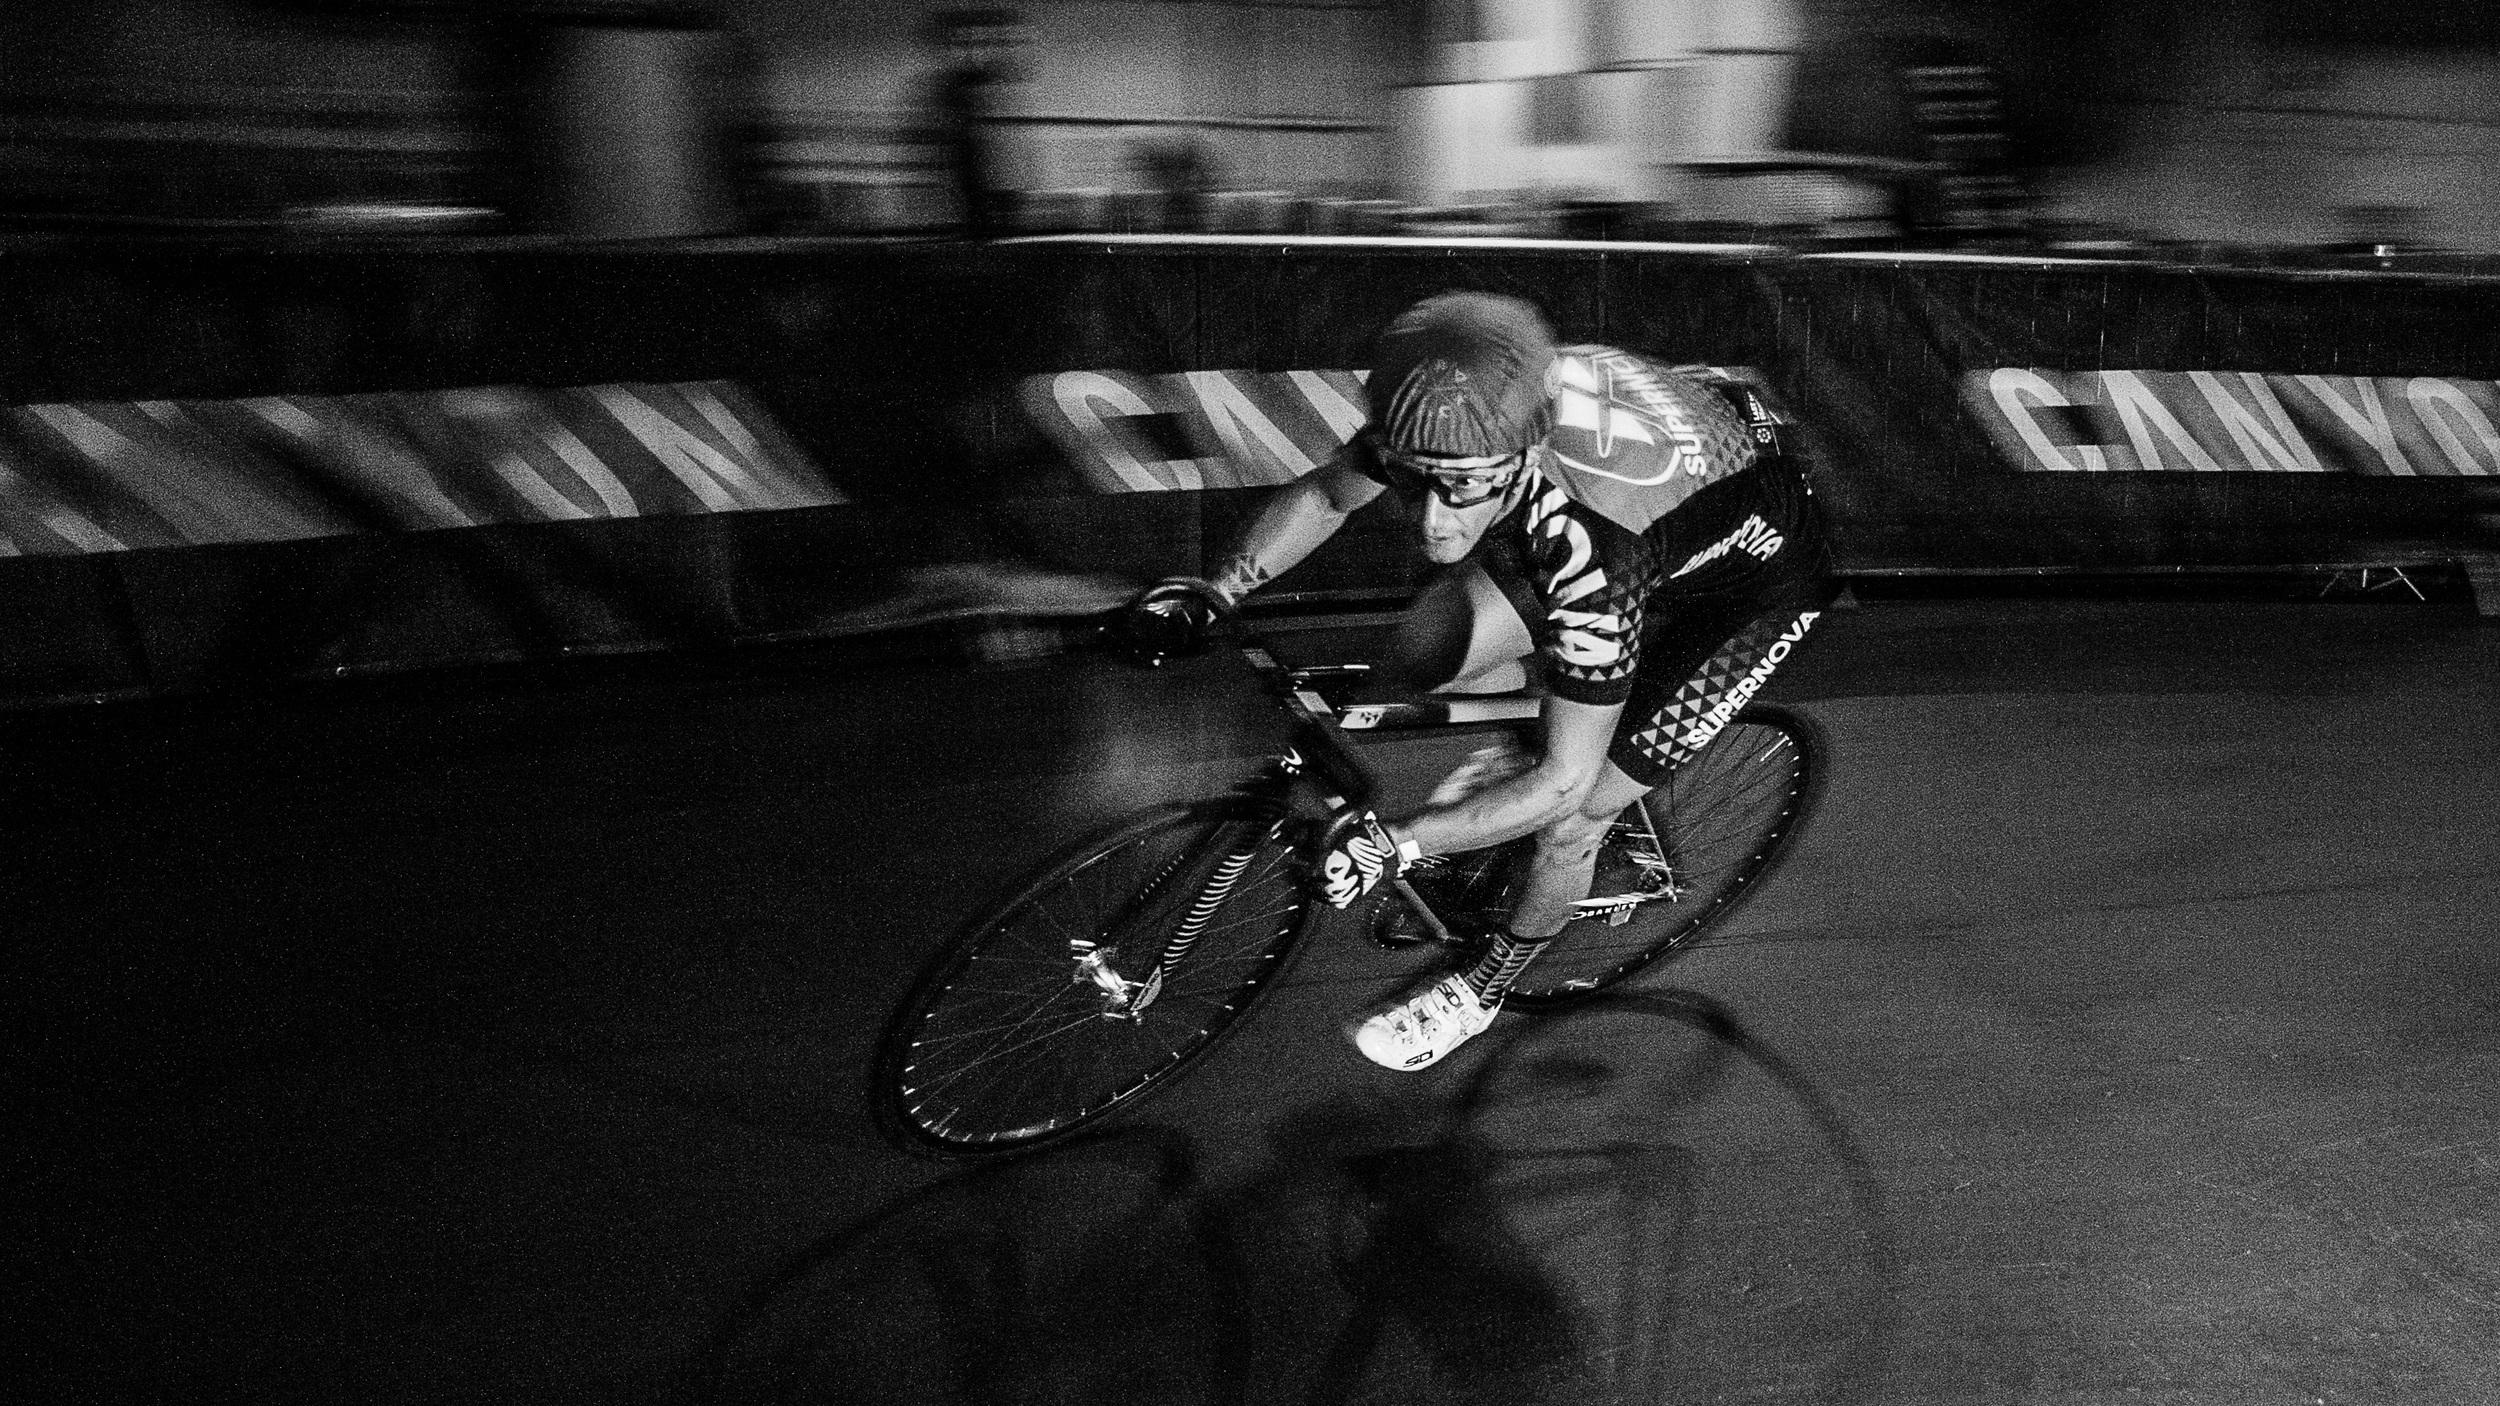 RAD RACE Last Man Standing, Berlin March 19 2016 - Shot by Drew Kaplan 31.jpg